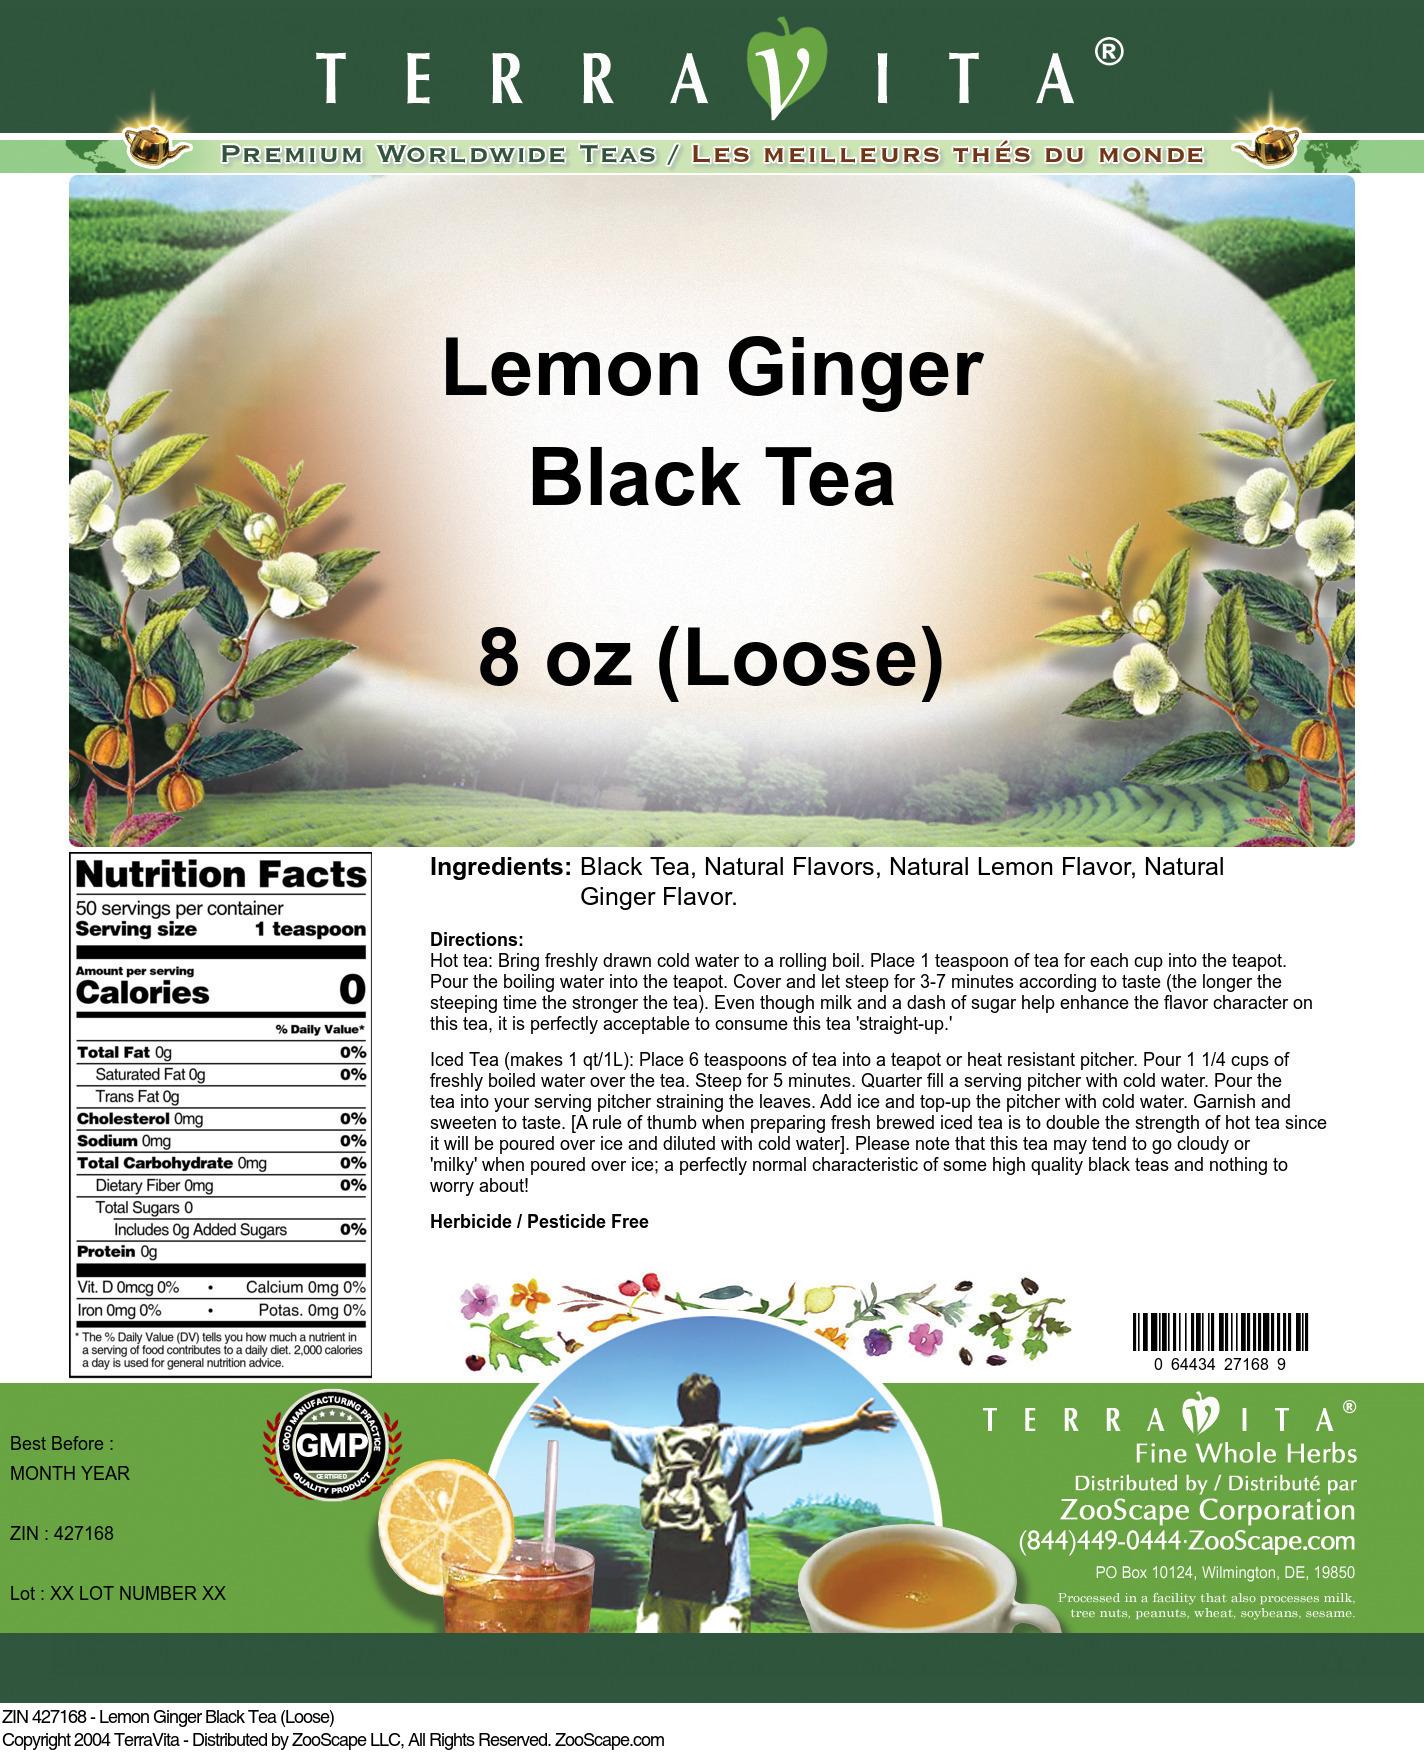 Lemon Ginger Black Tea (Loose)